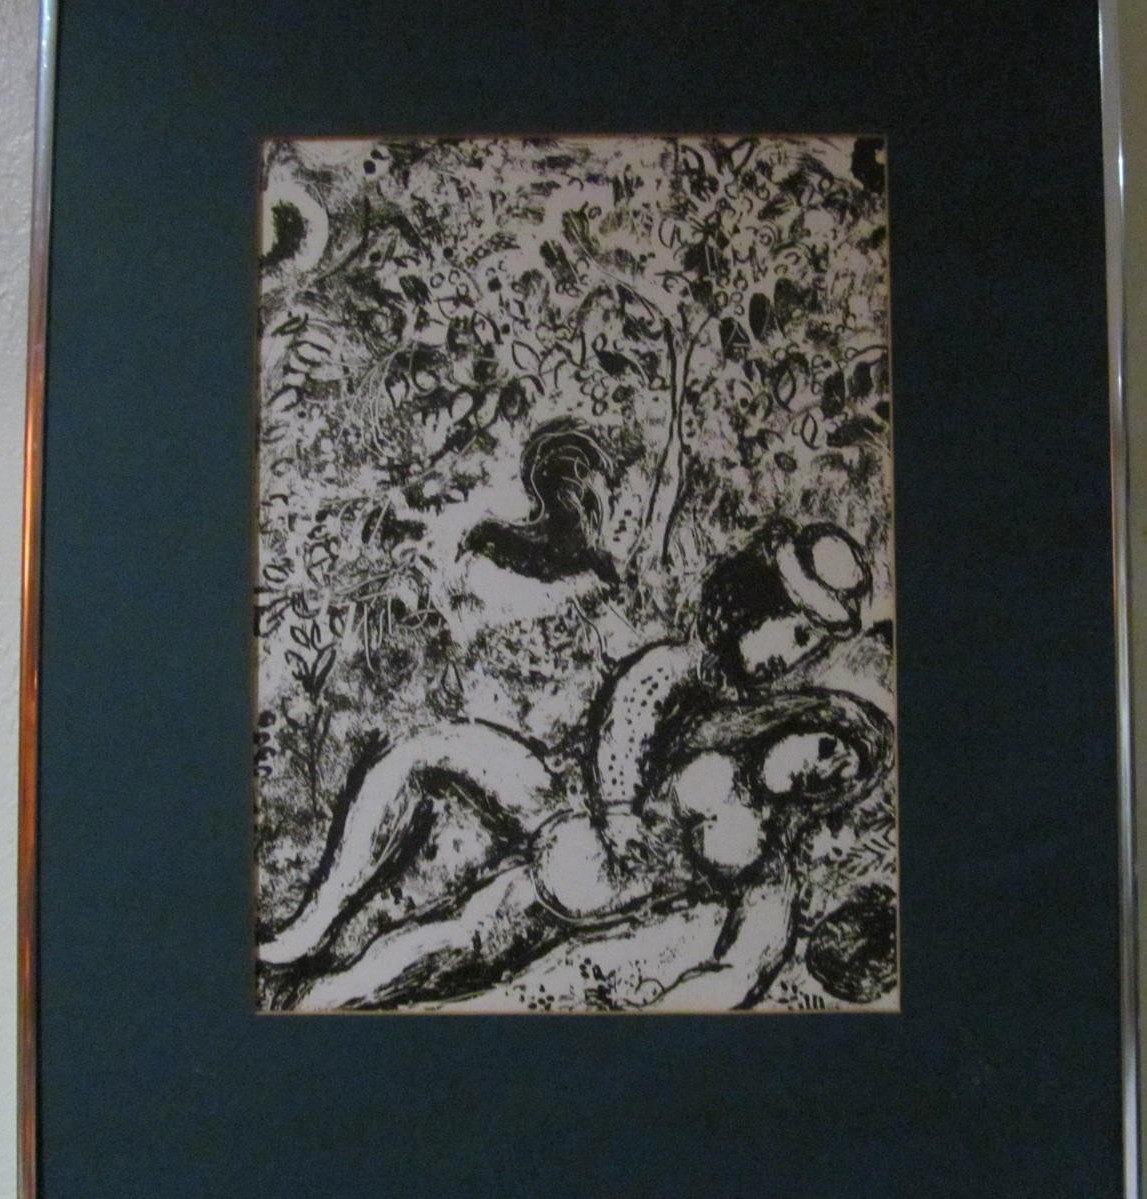 Marc Chagall 1963 Le Couple a L'arbre, Original Black & White Llithograph Print